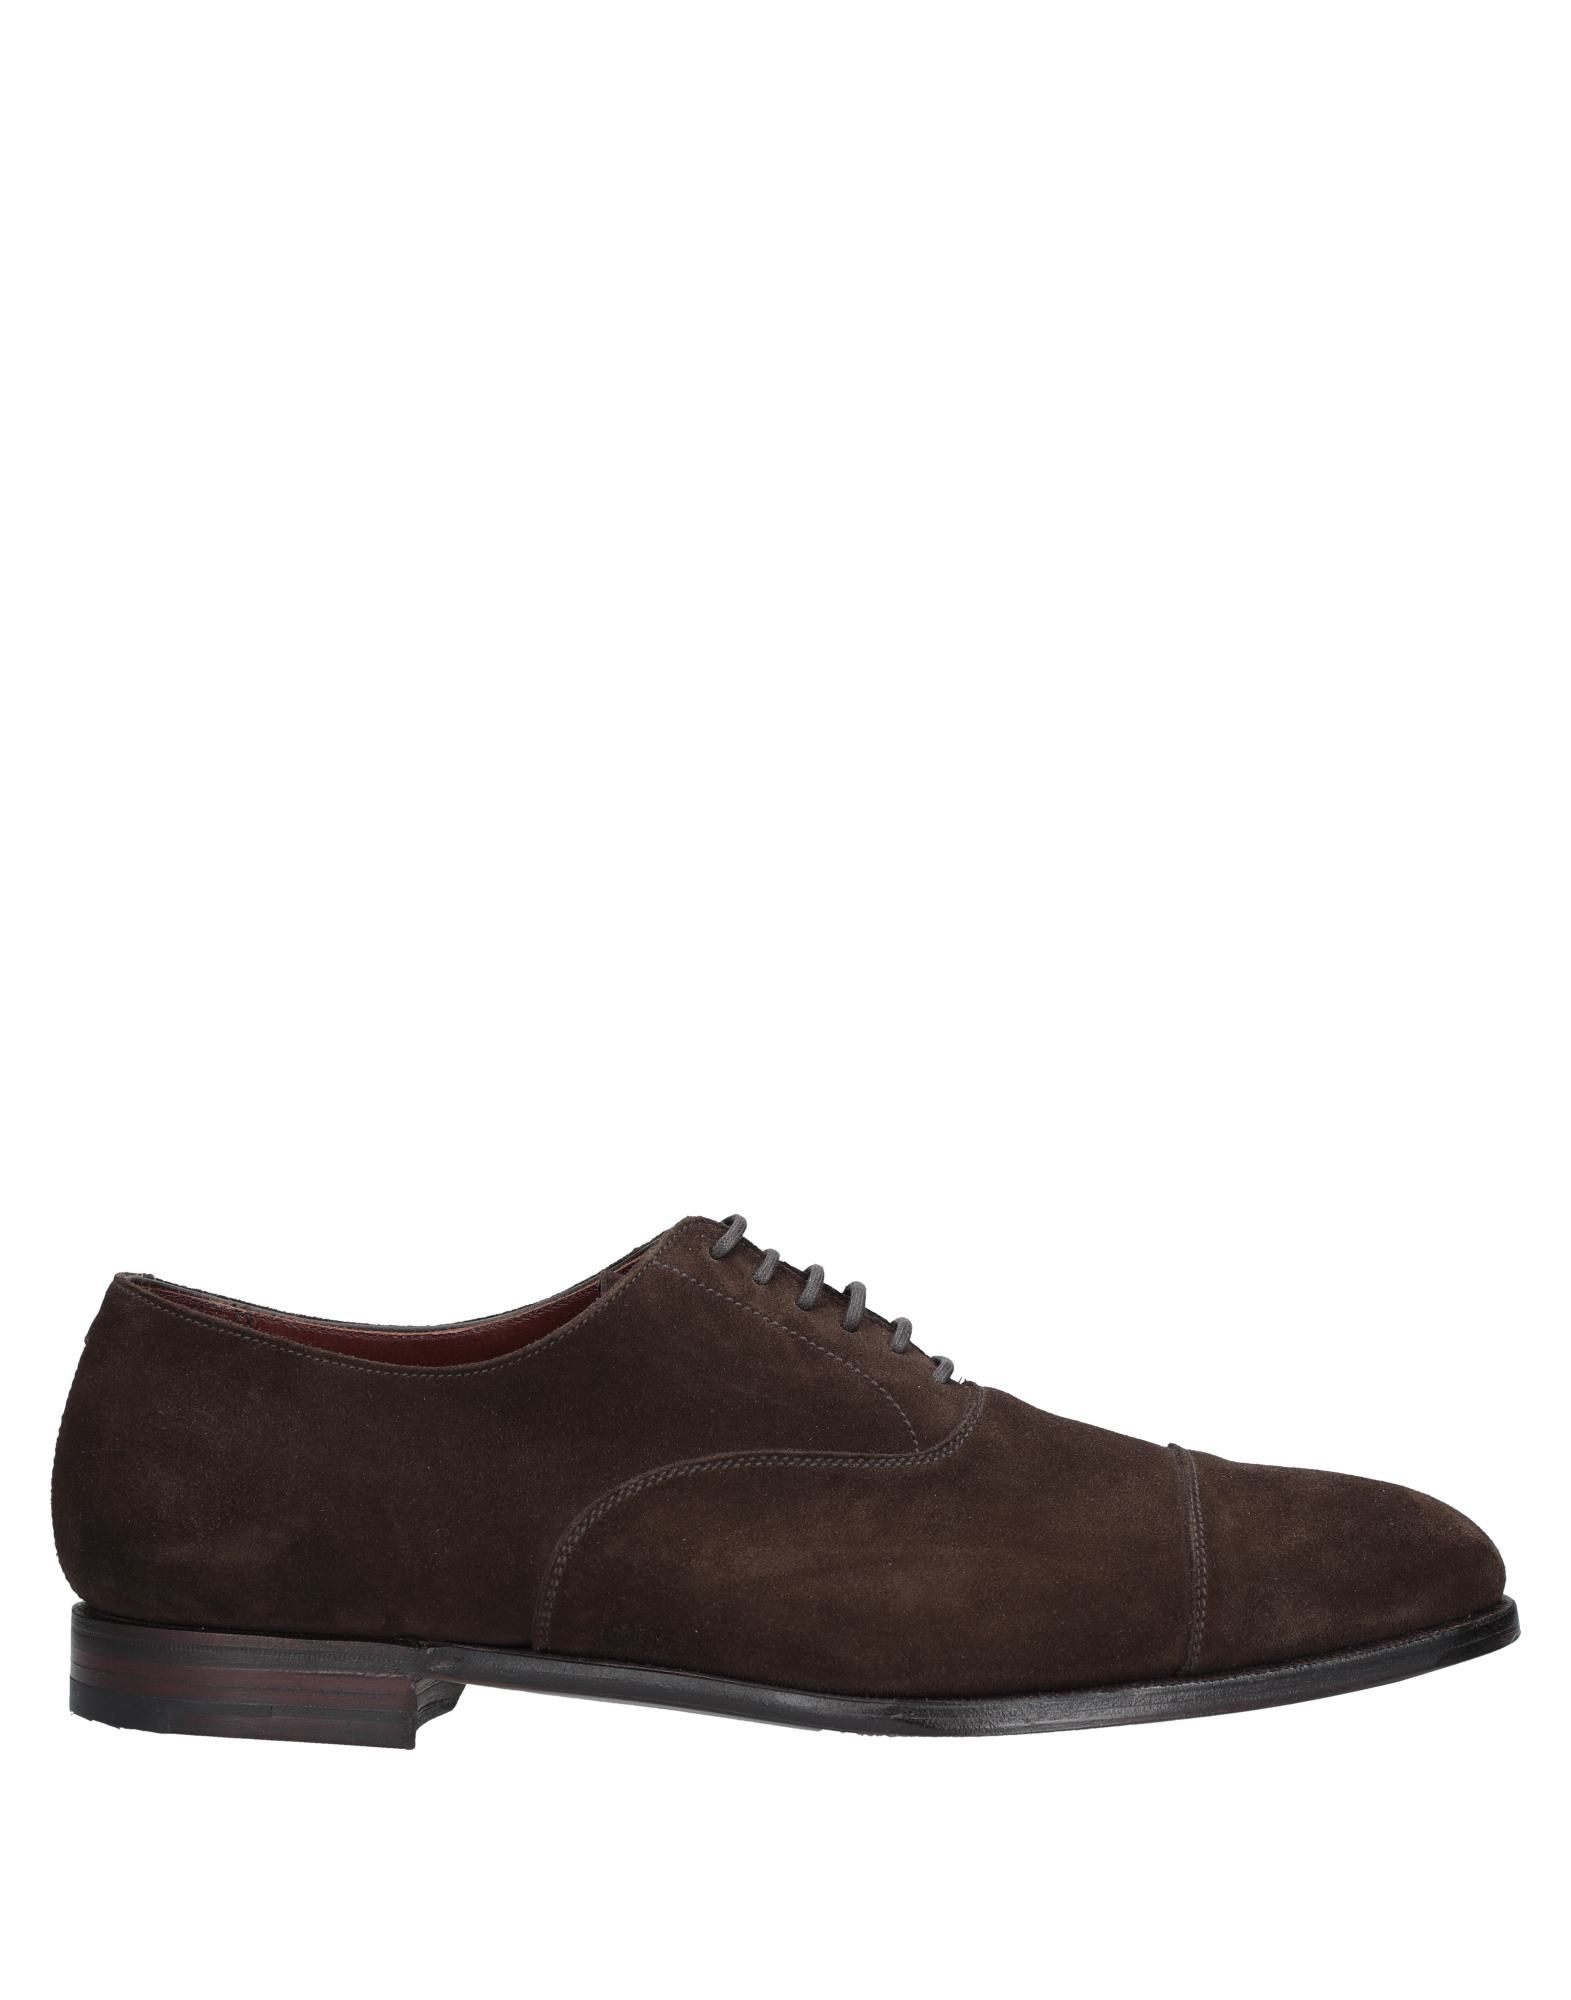 Crockett & Jones Schnürschuhe Herren  11528448XF Gute Qualität beliebte Schuhe